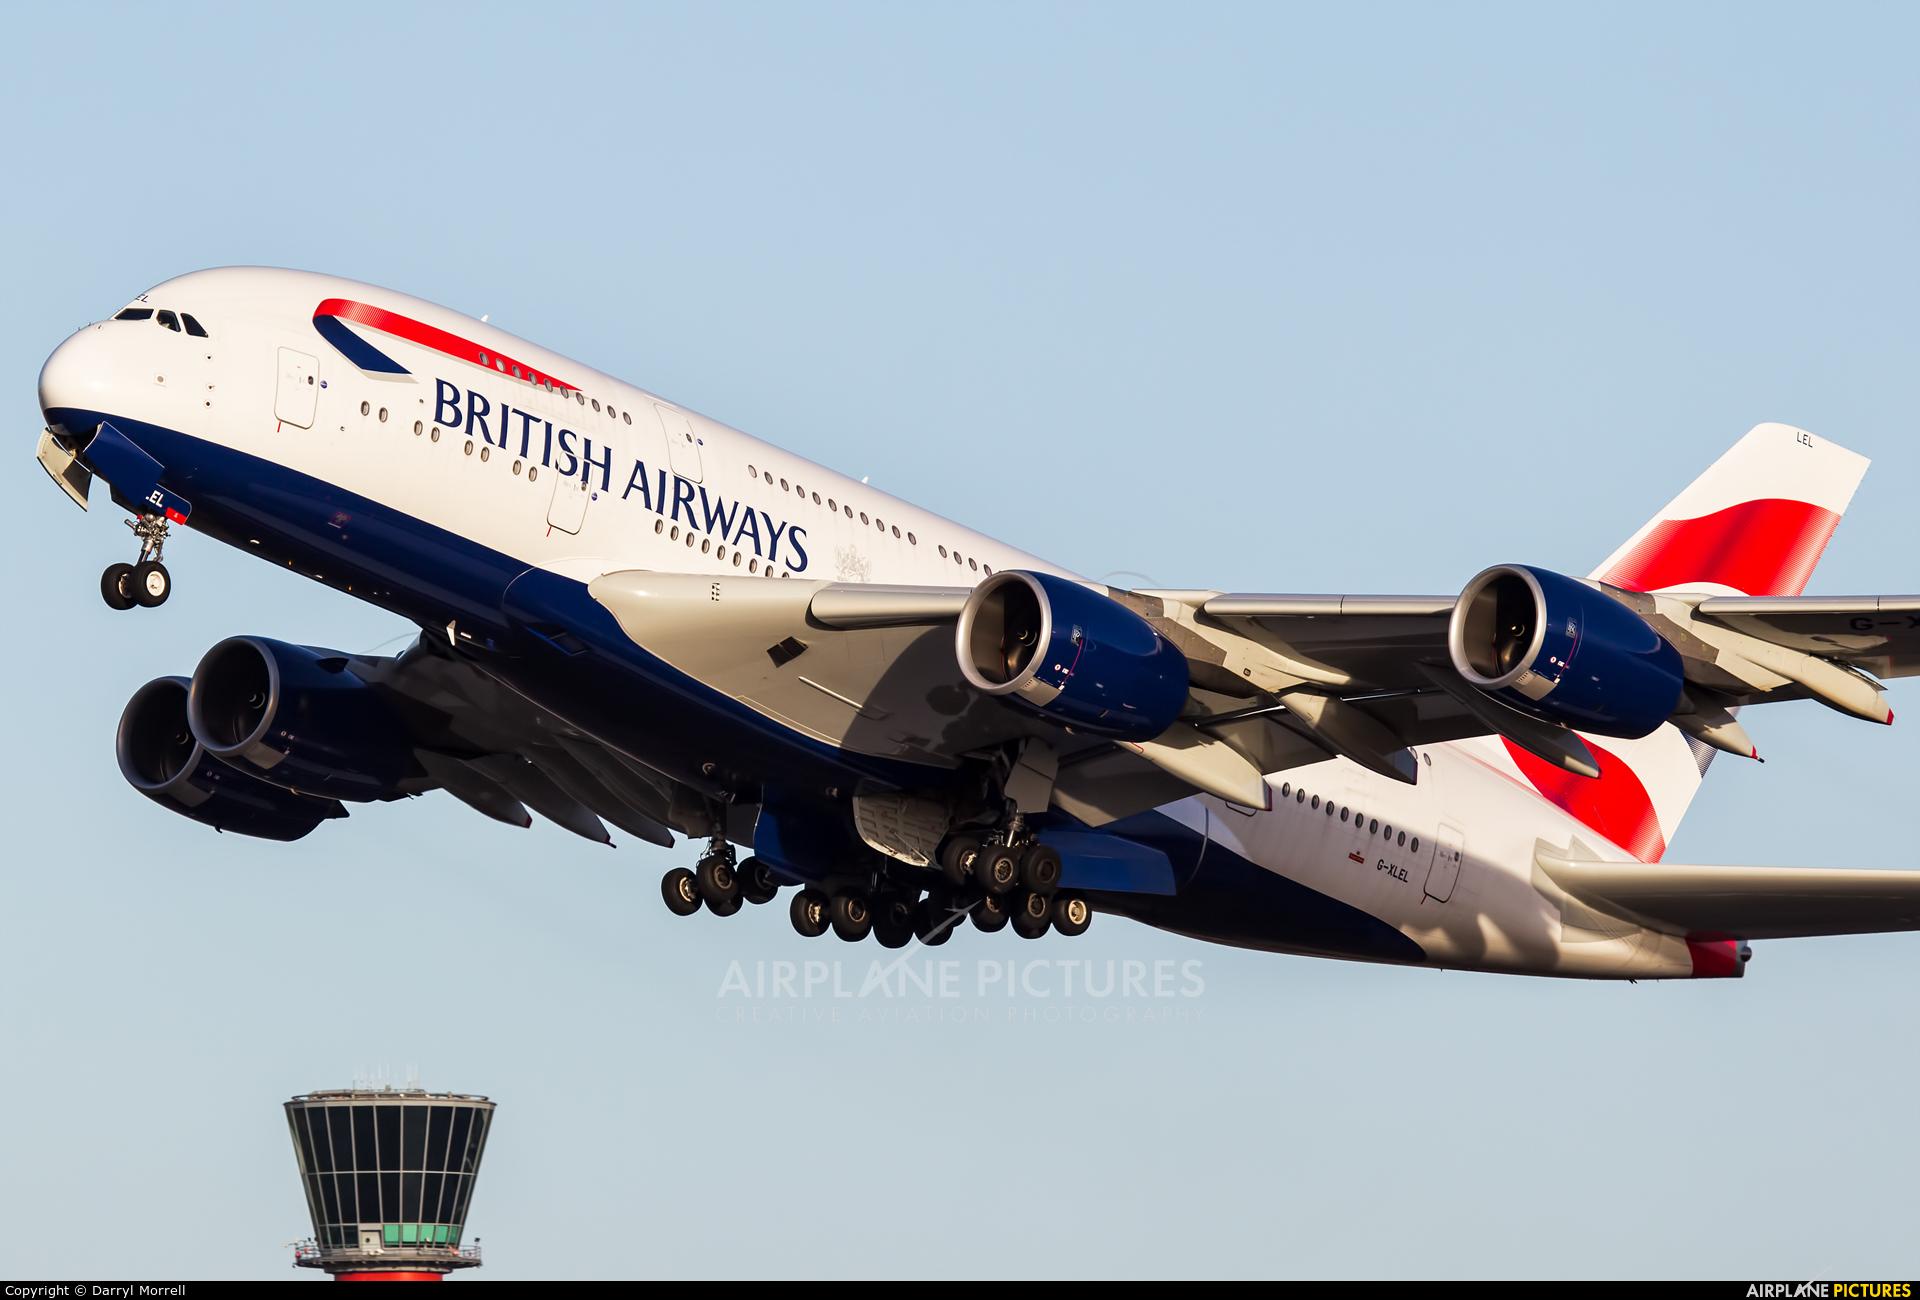 British Airways G-XLEL aircraft at London - Heathrow